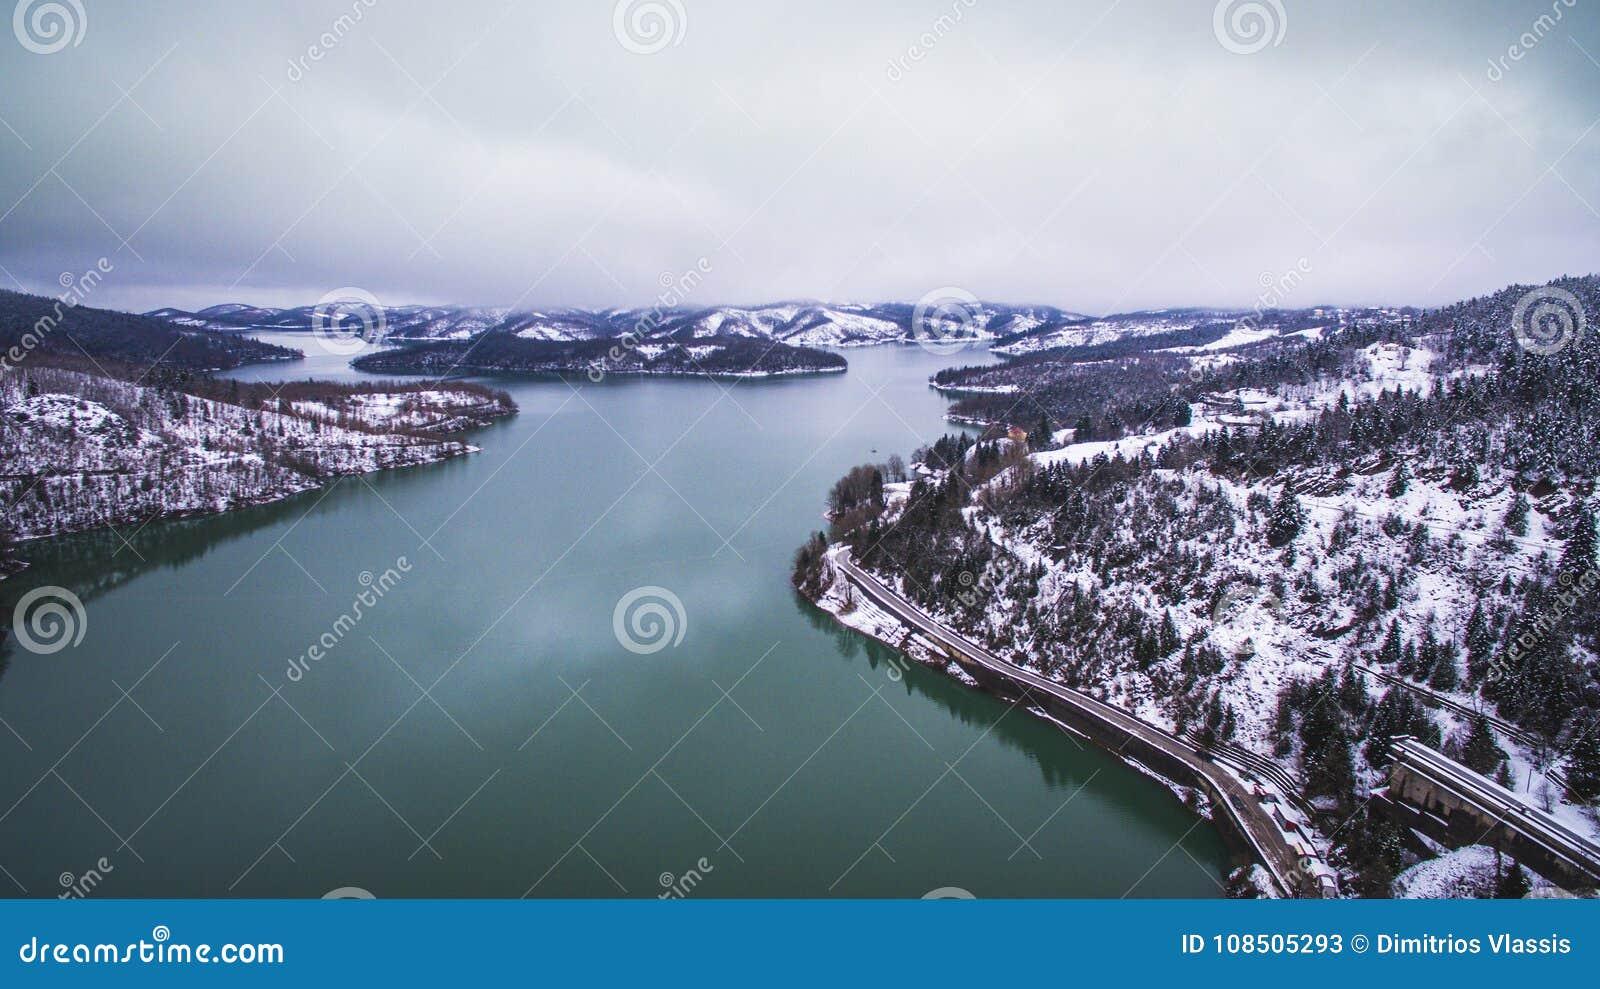 Aerial drone image of Plastiras lake and dam.